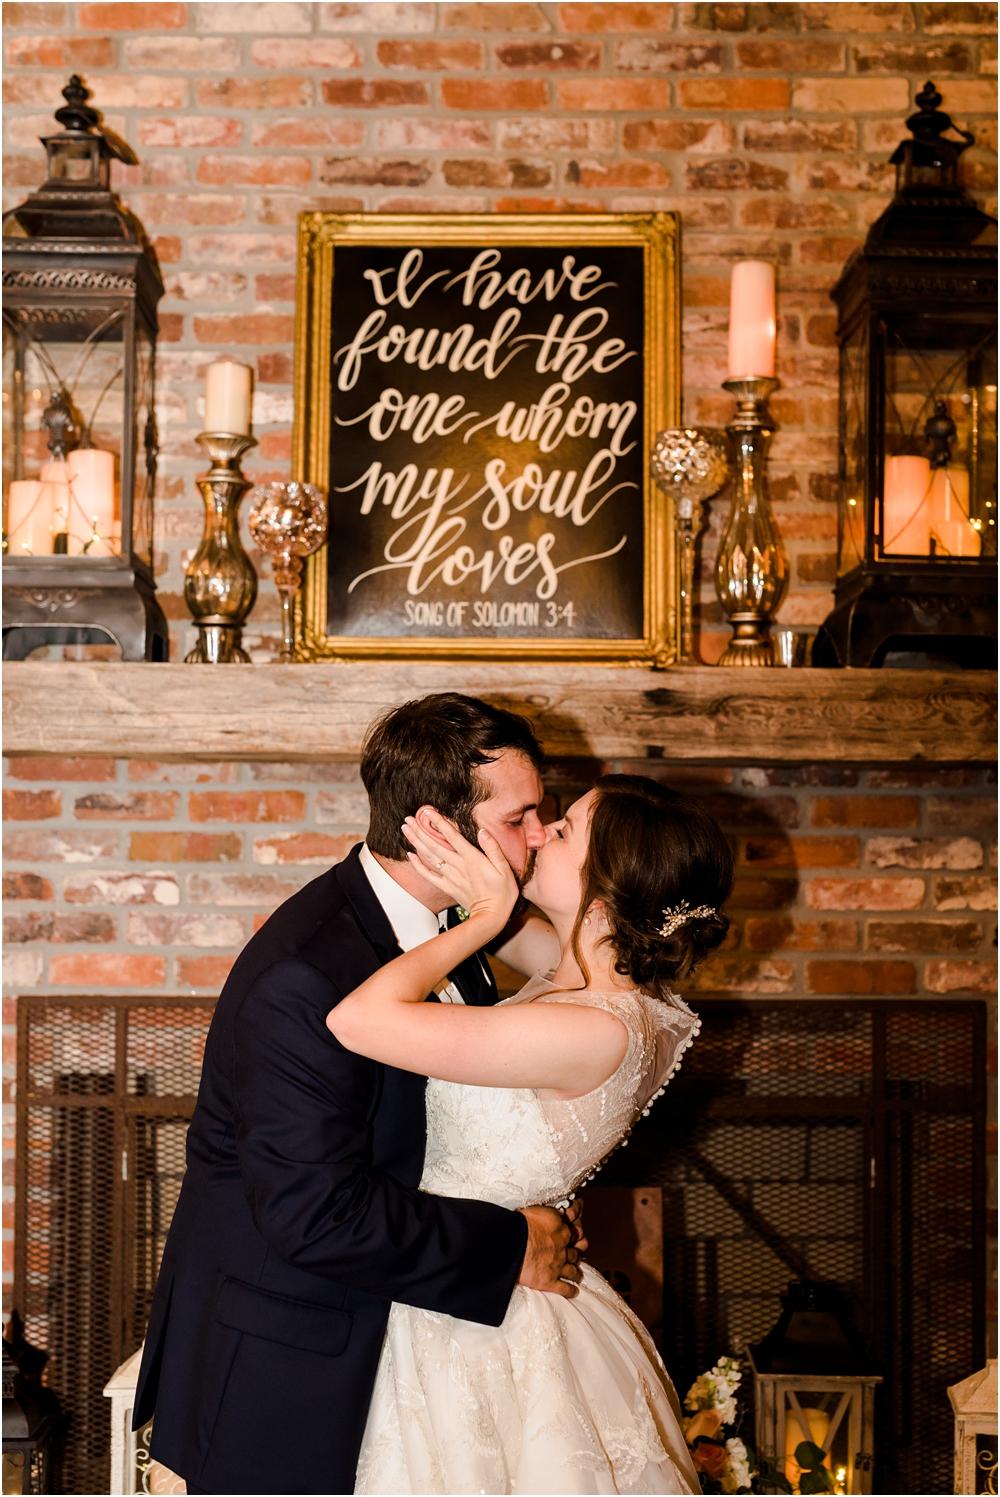 marianna-florida-wedding-photographer-kiersten-grant-216.jpg